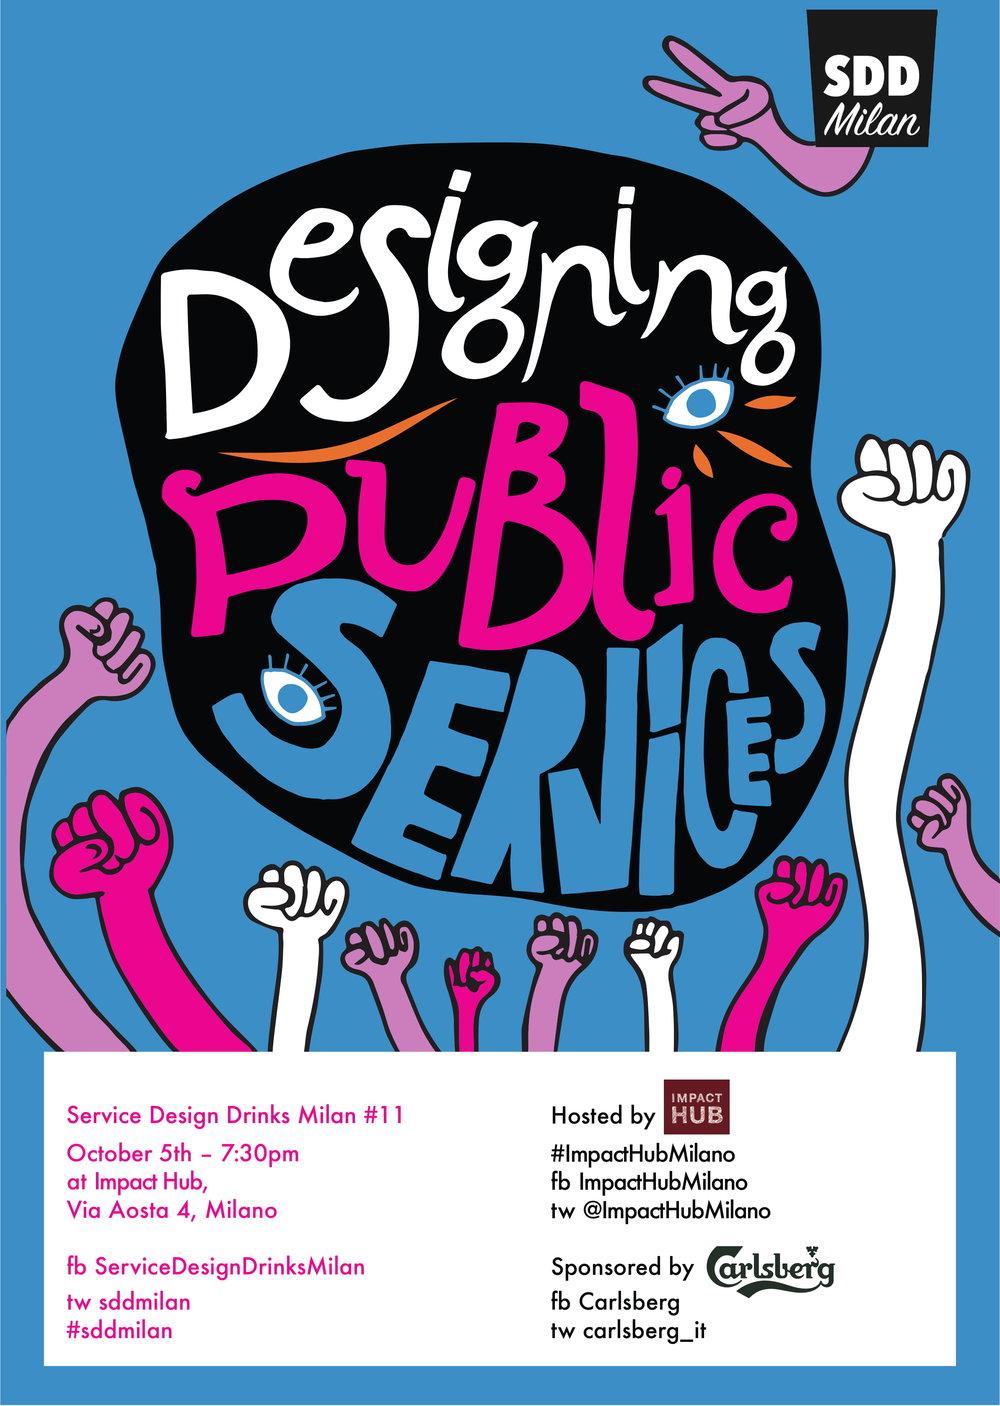 Service Design Drinks Milan #11 - Designing Public Services